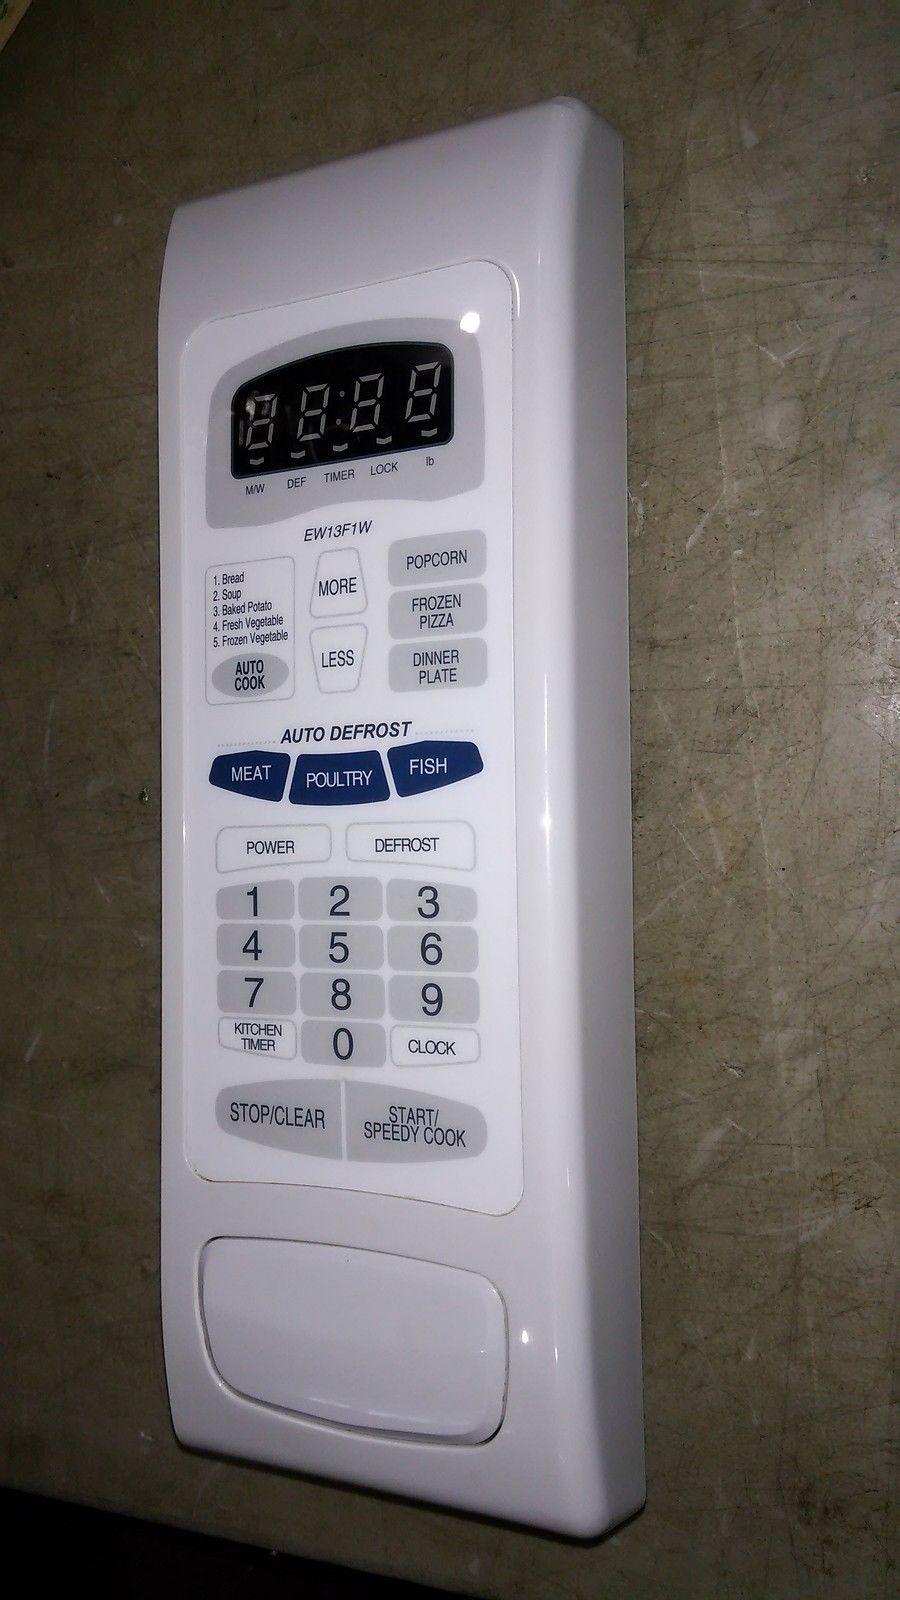 6 Cc21 Ewave Microwave Oven Ew13 F1 W